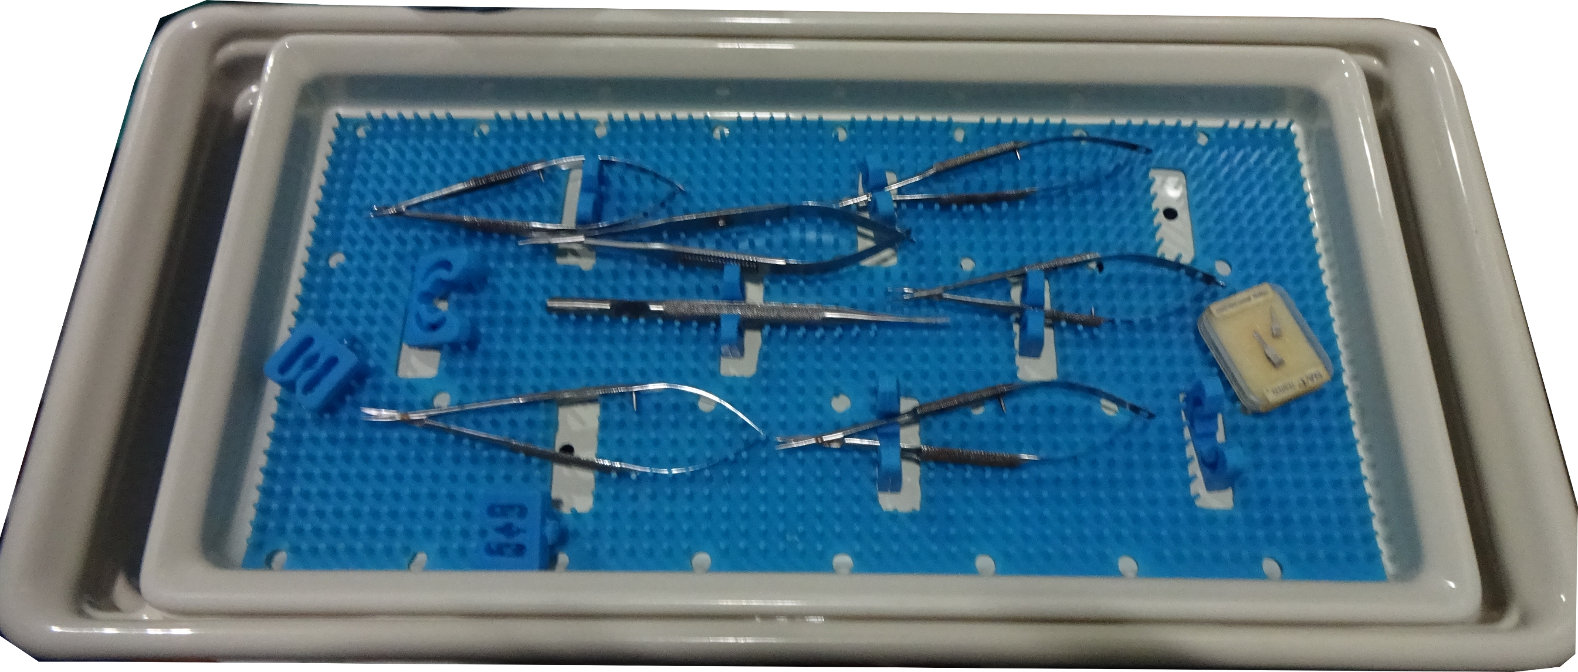 endosys plastic sterilization trays